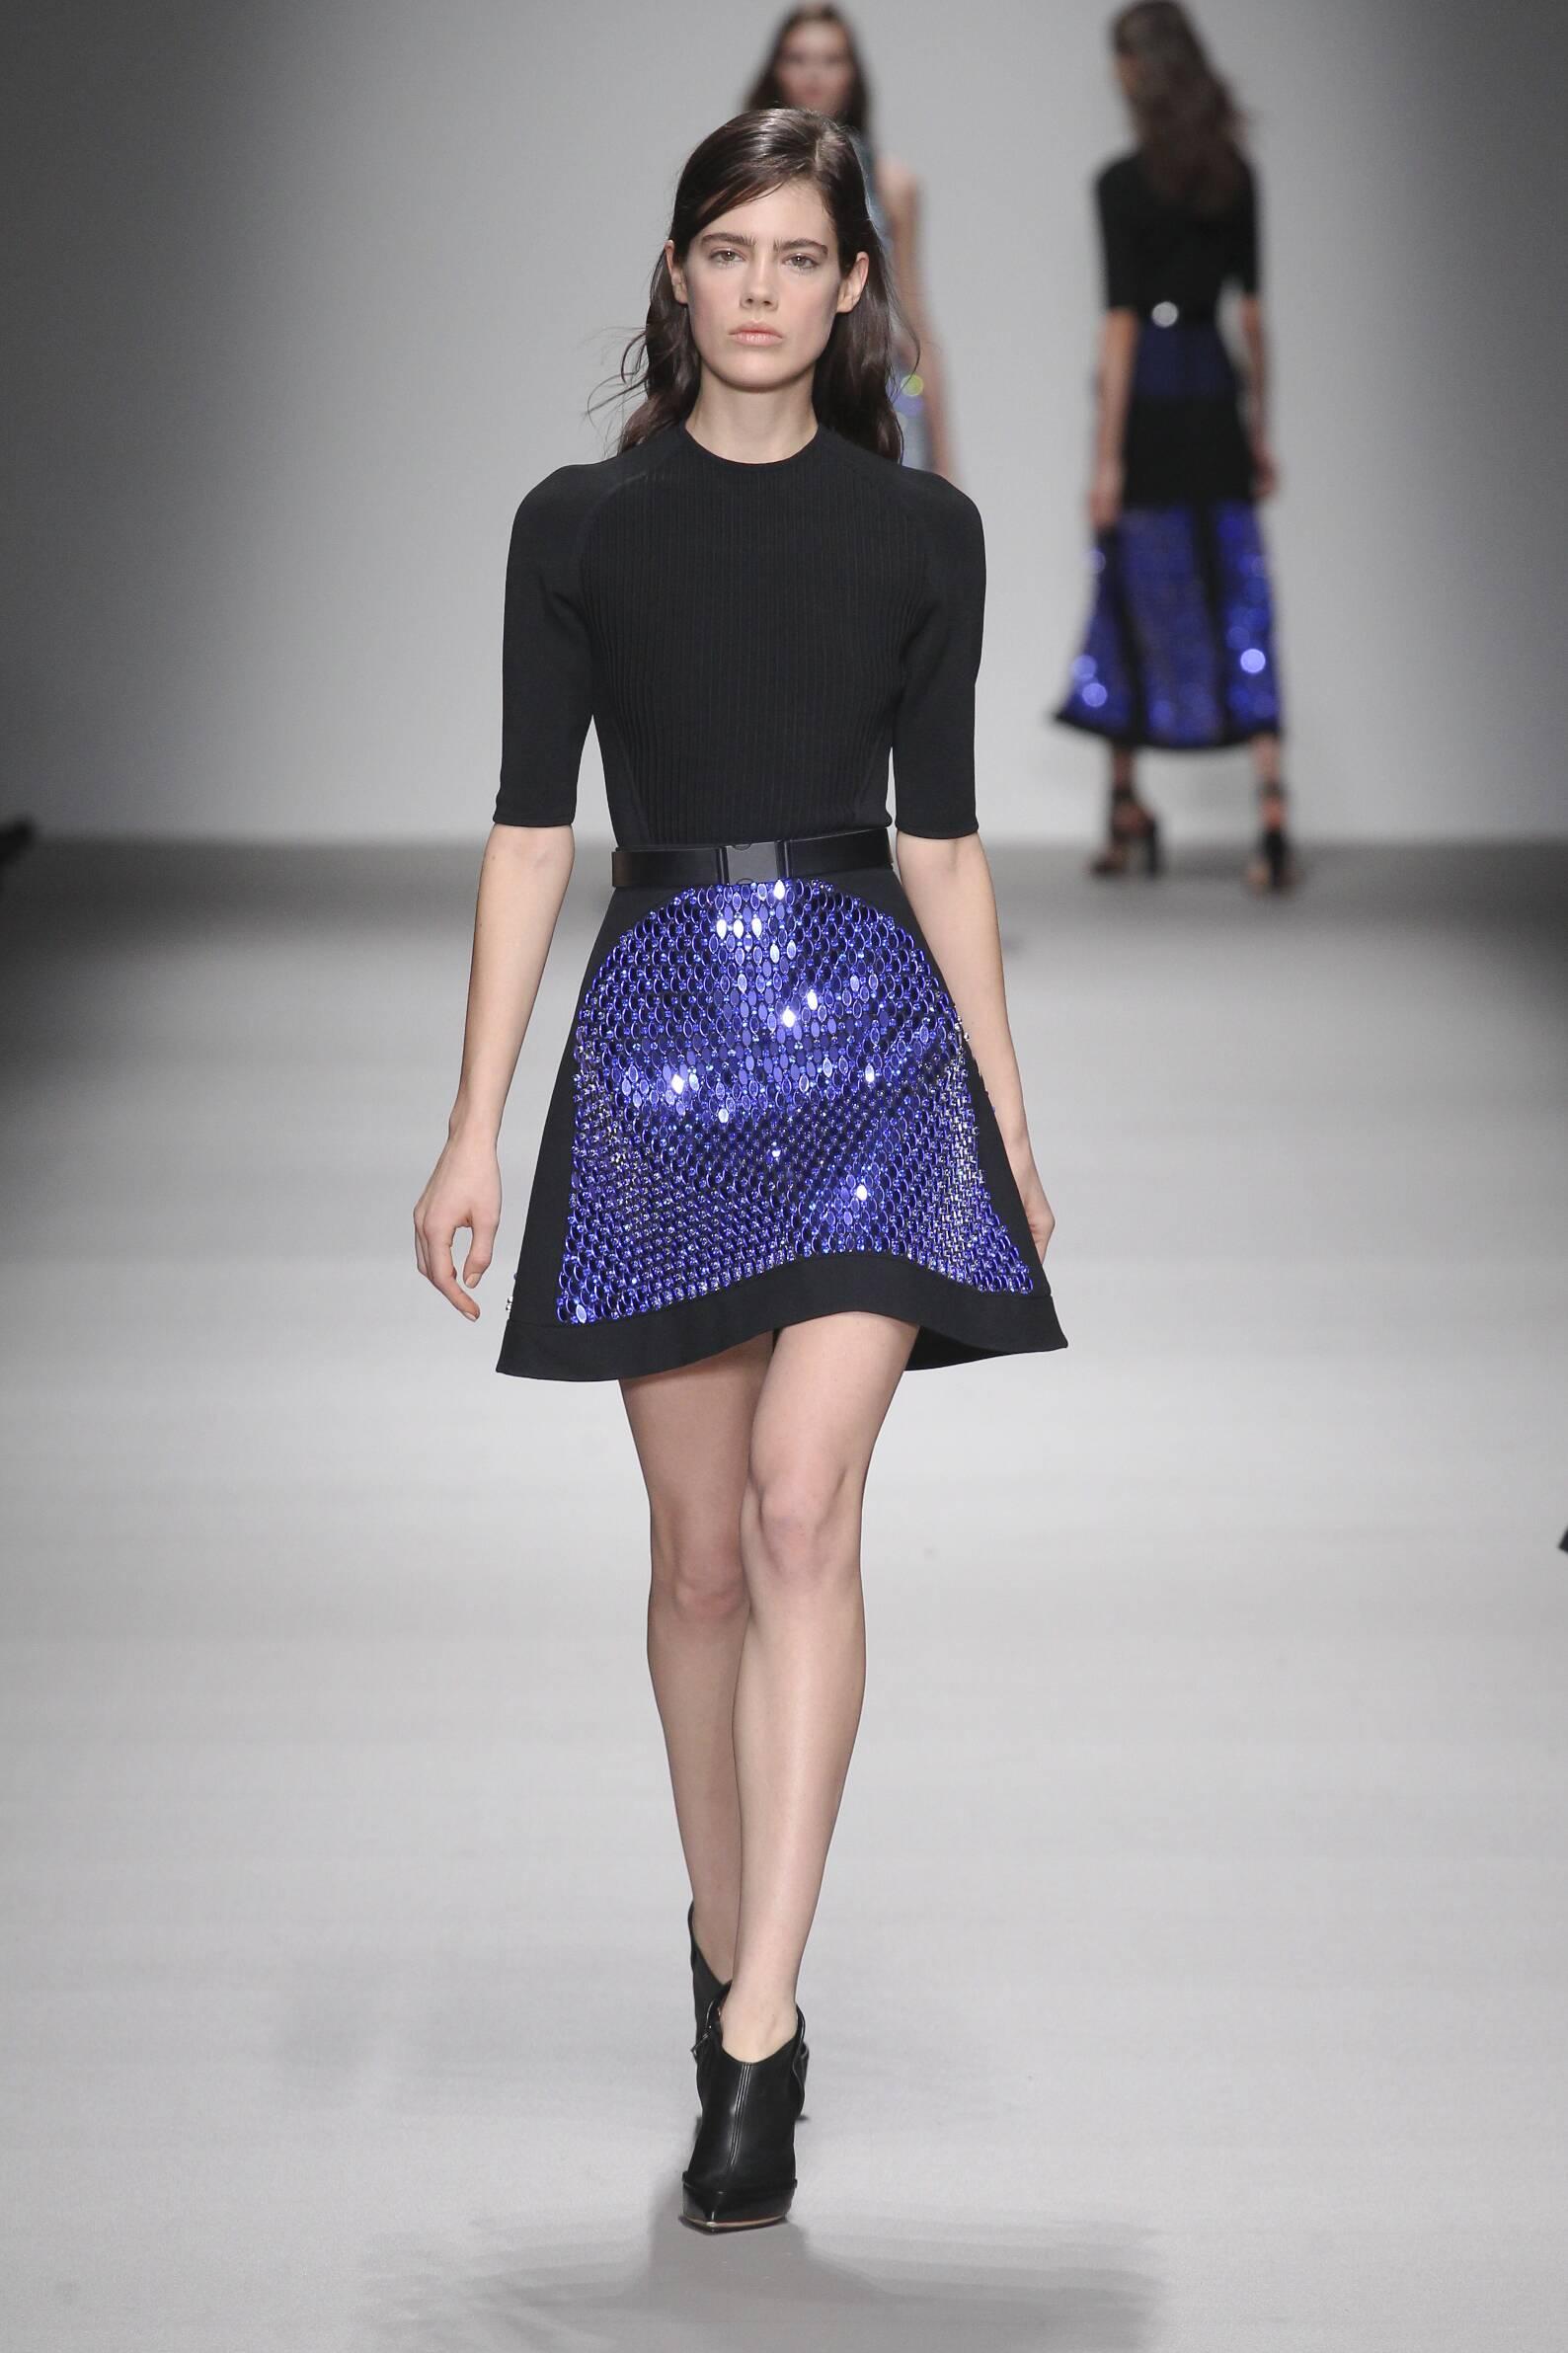 Fall David Koma Collection Fashion Woman Model